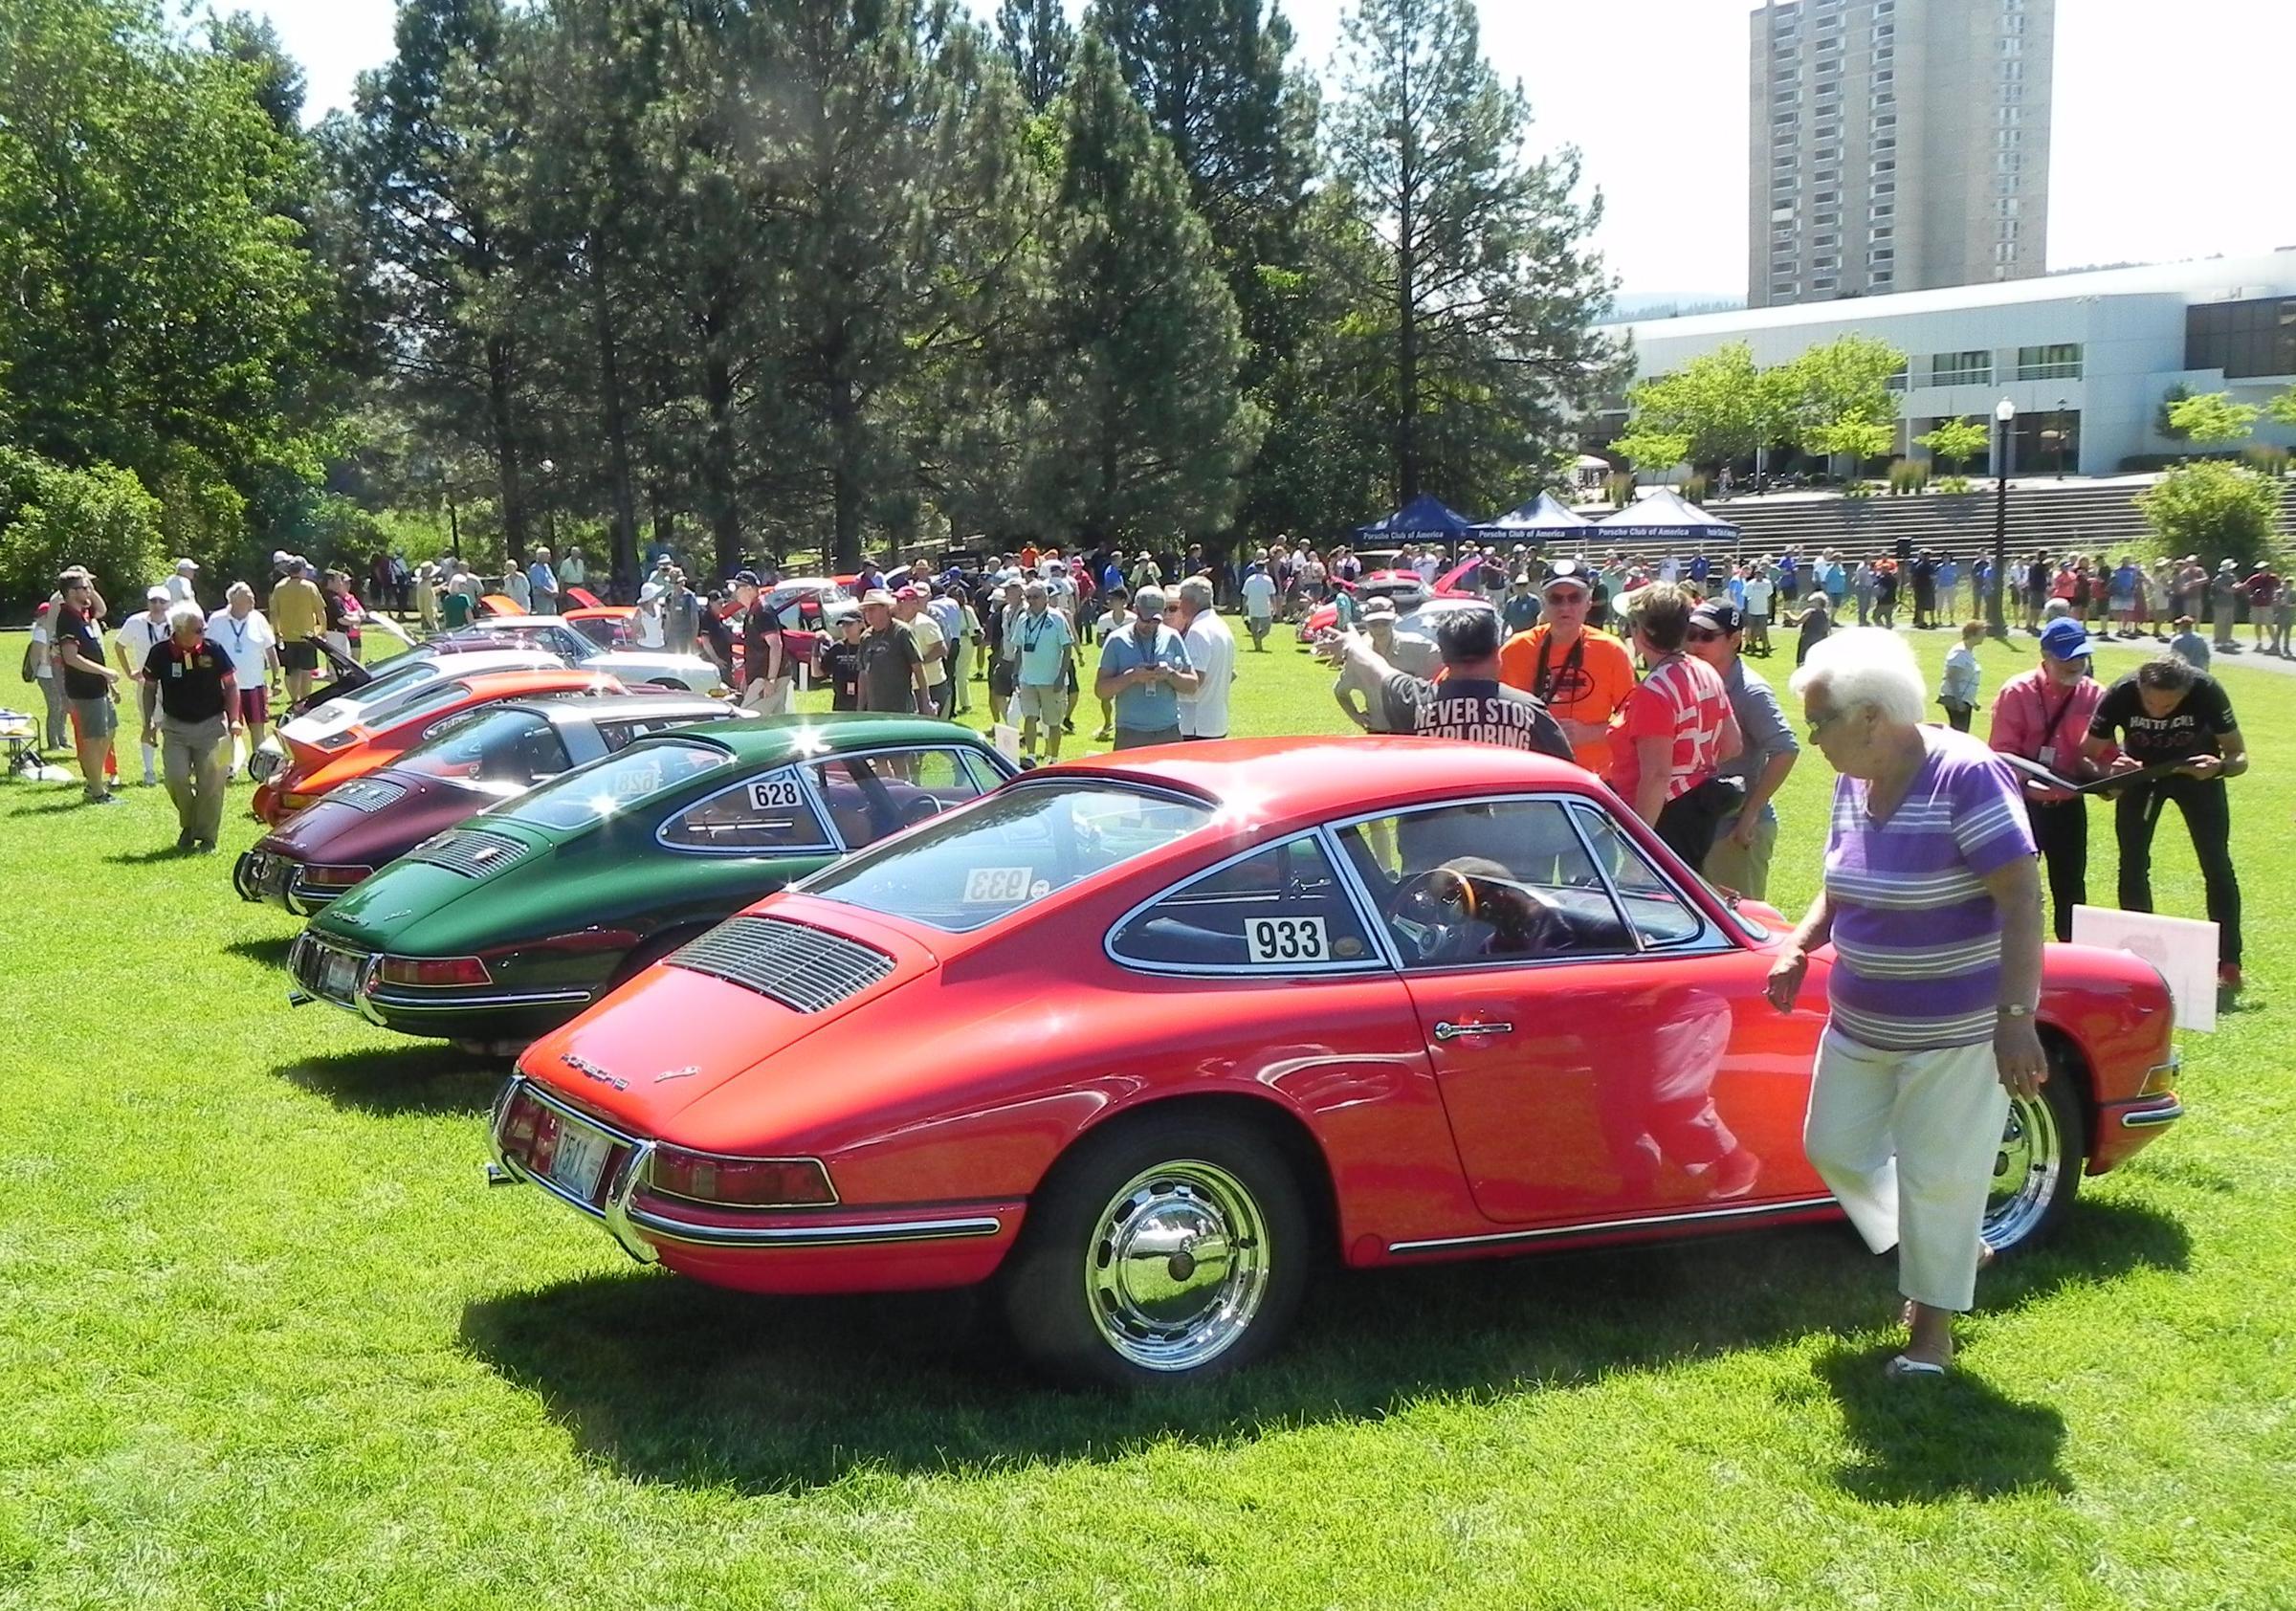 National Porsche Parade Visits Spokane Spokane Public Radio